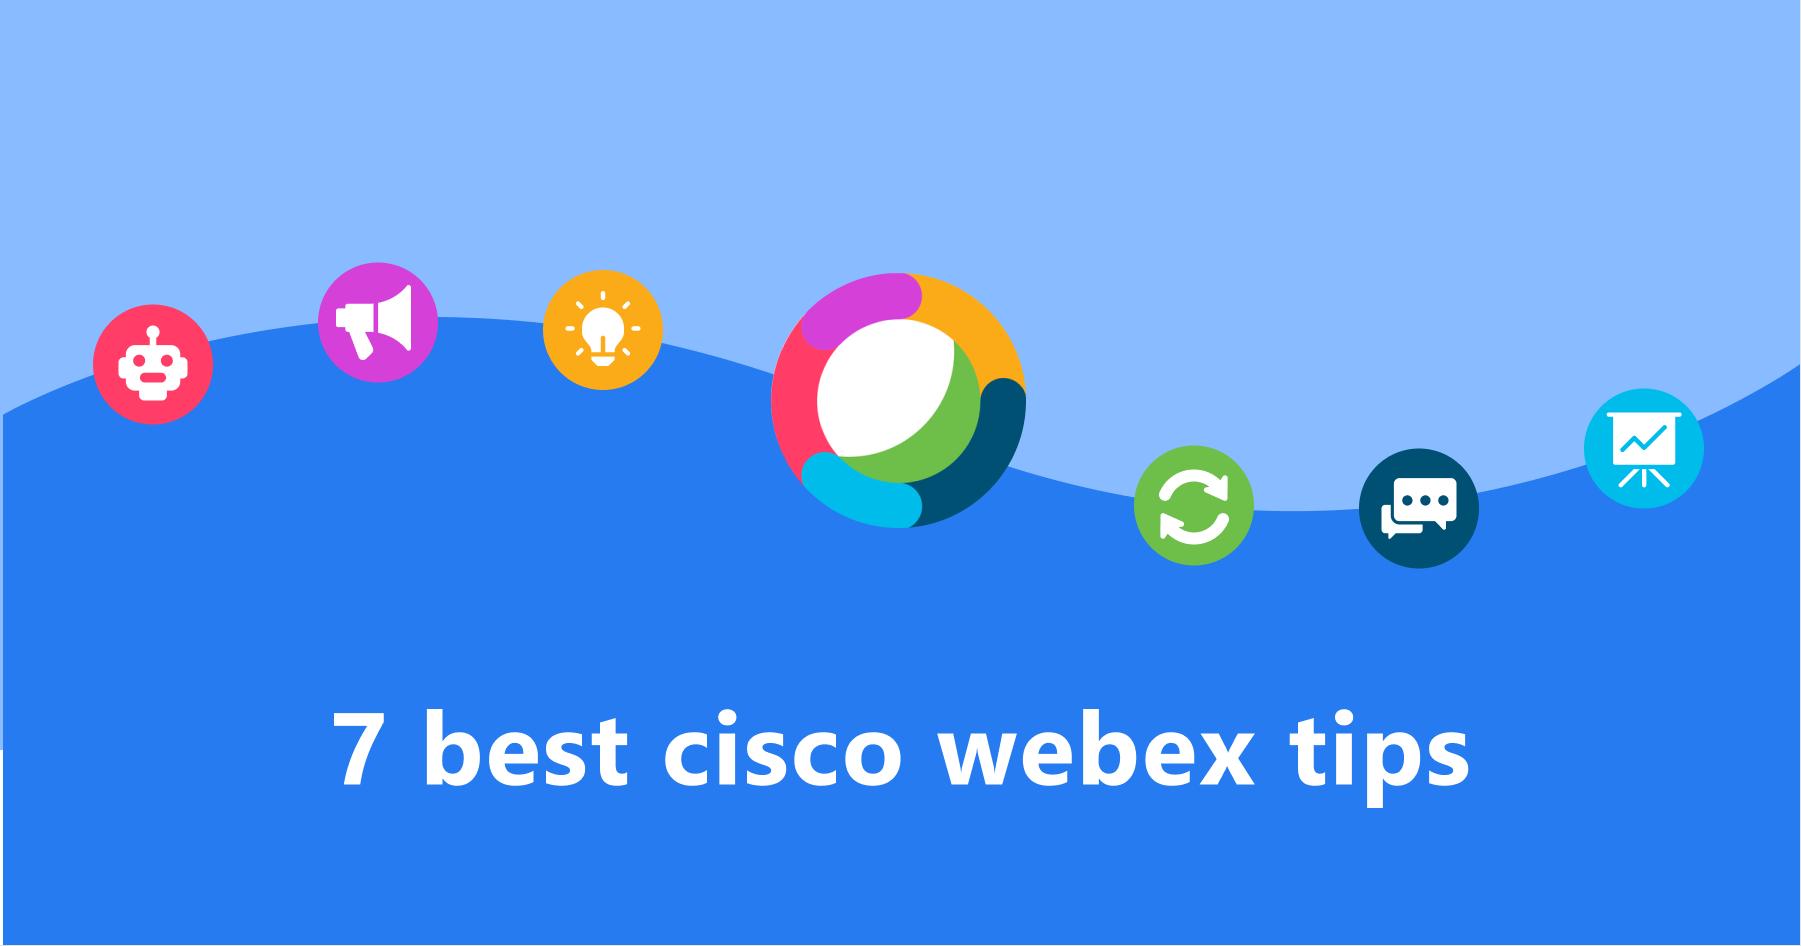 11 Cisco Webex Teams Hacks to Make Your Team More Efficient